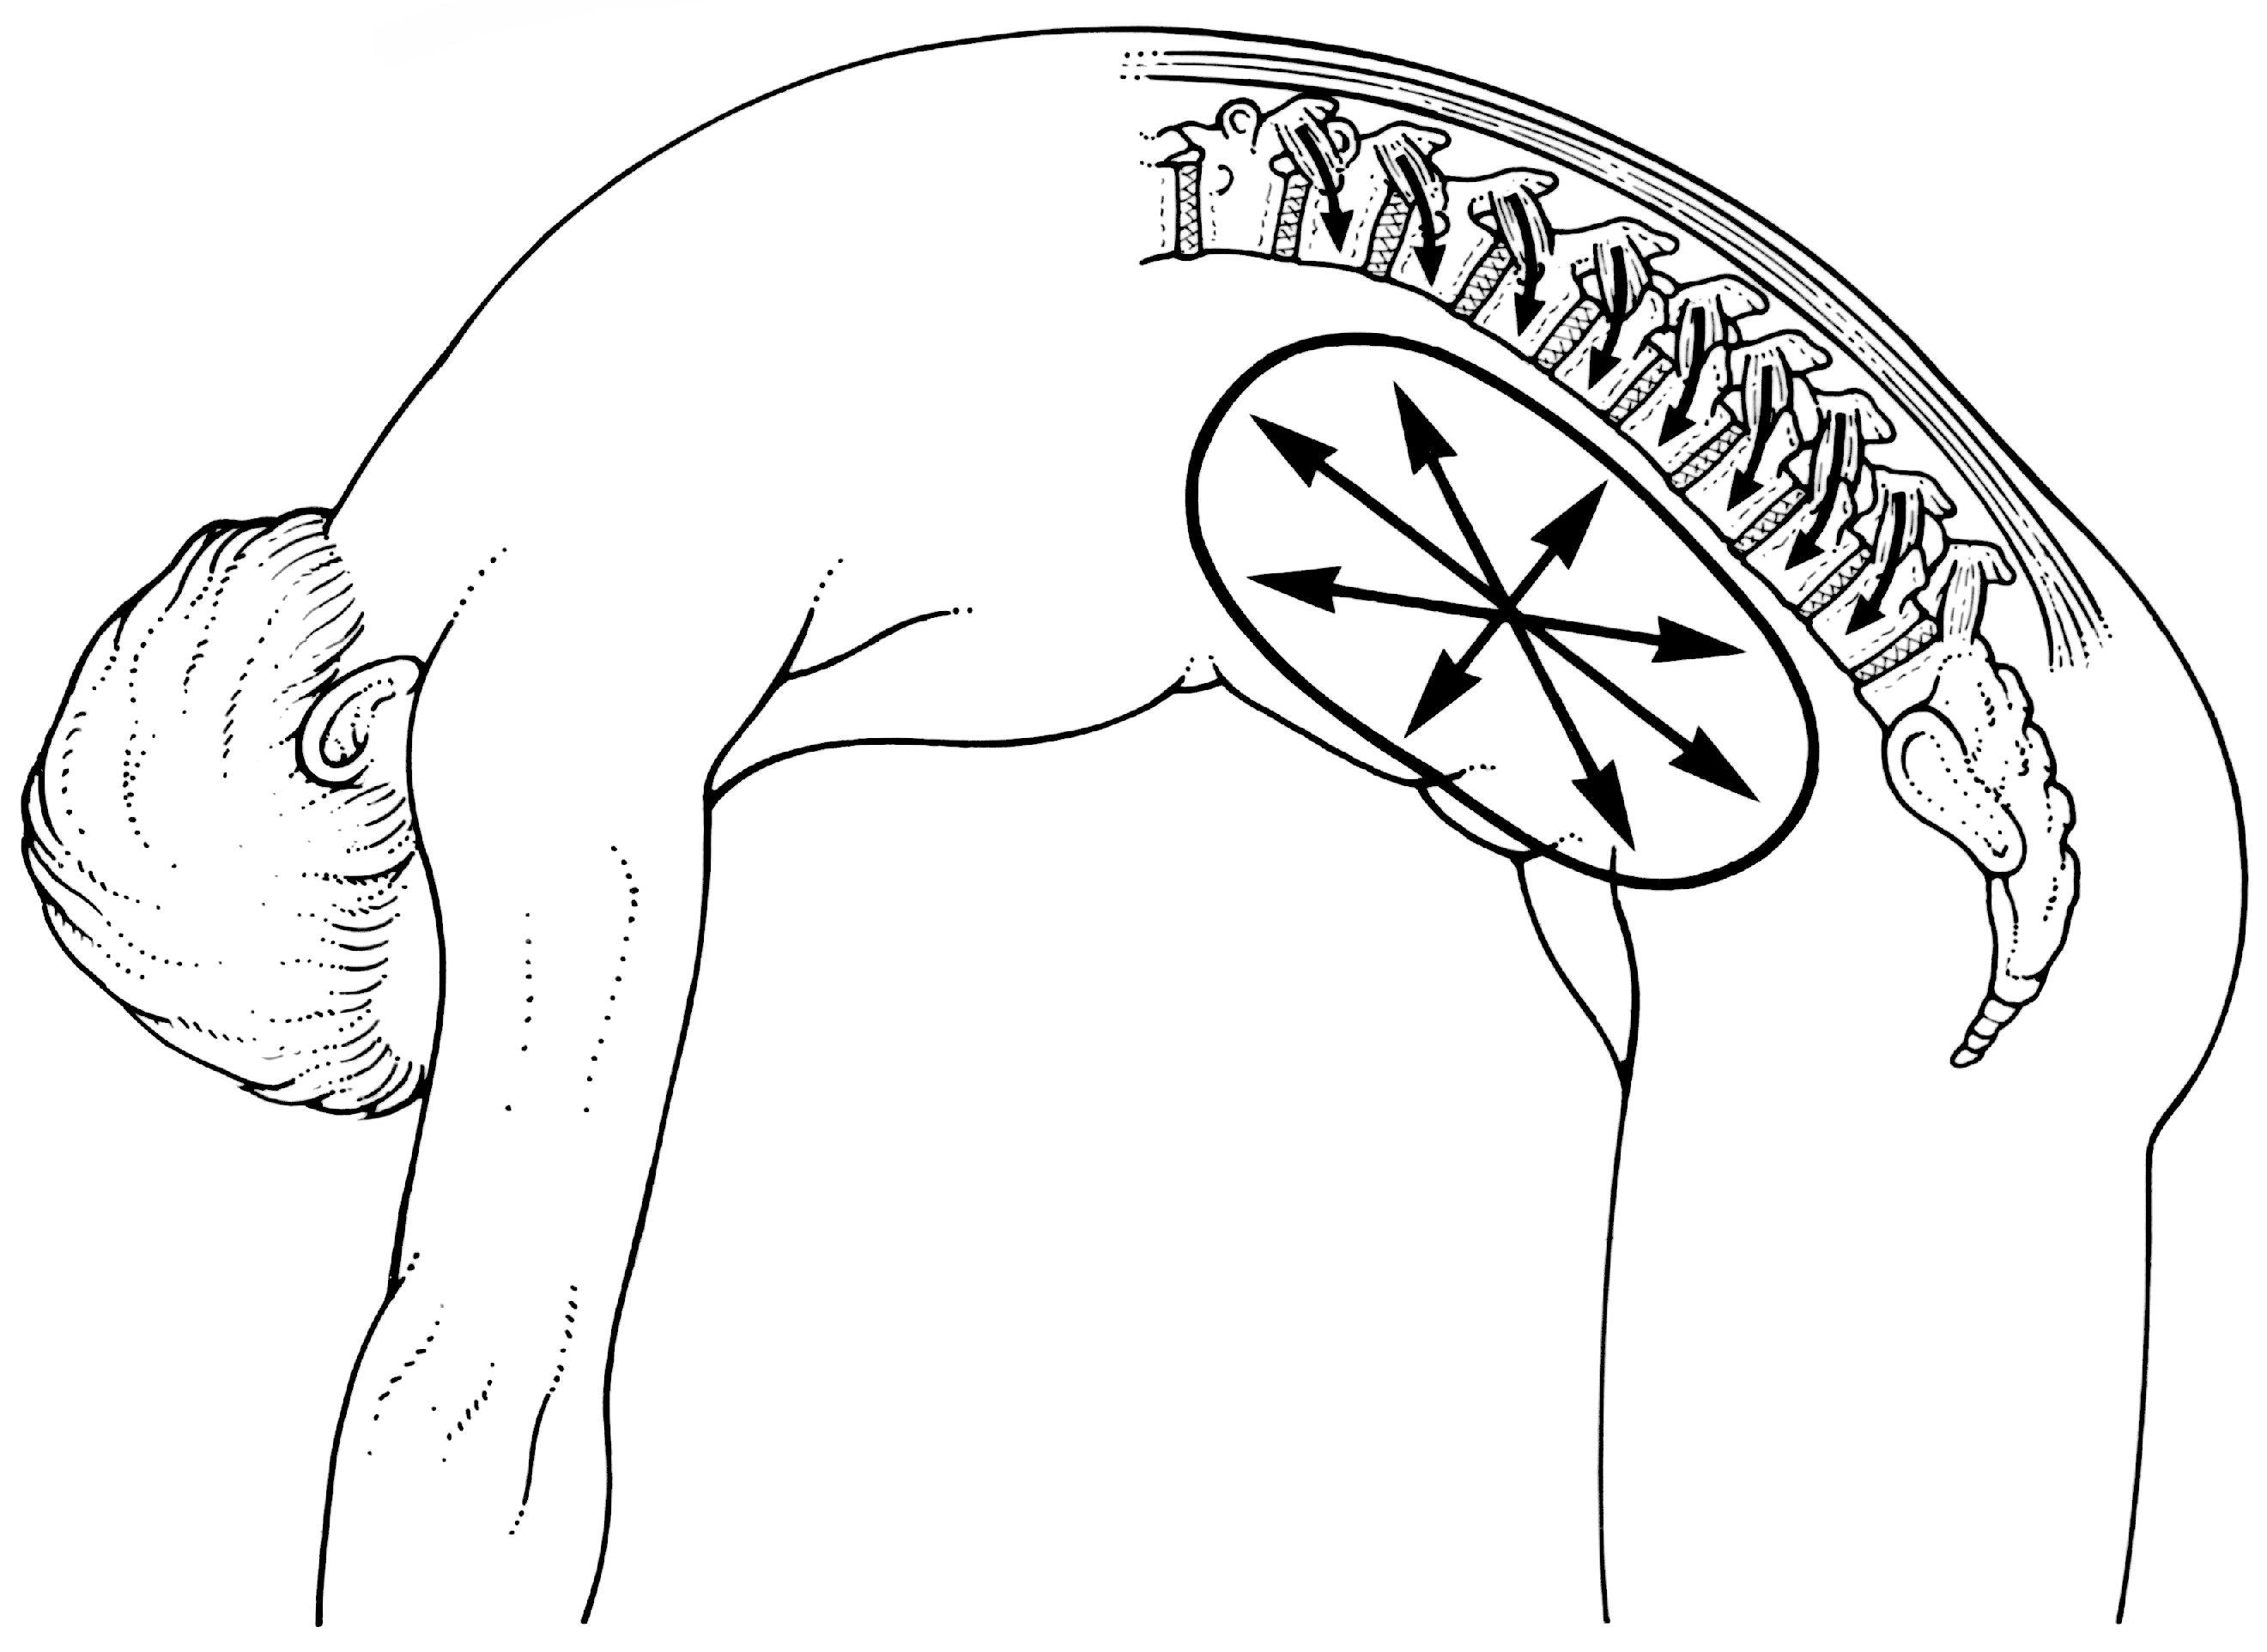 Shearers Back Pain